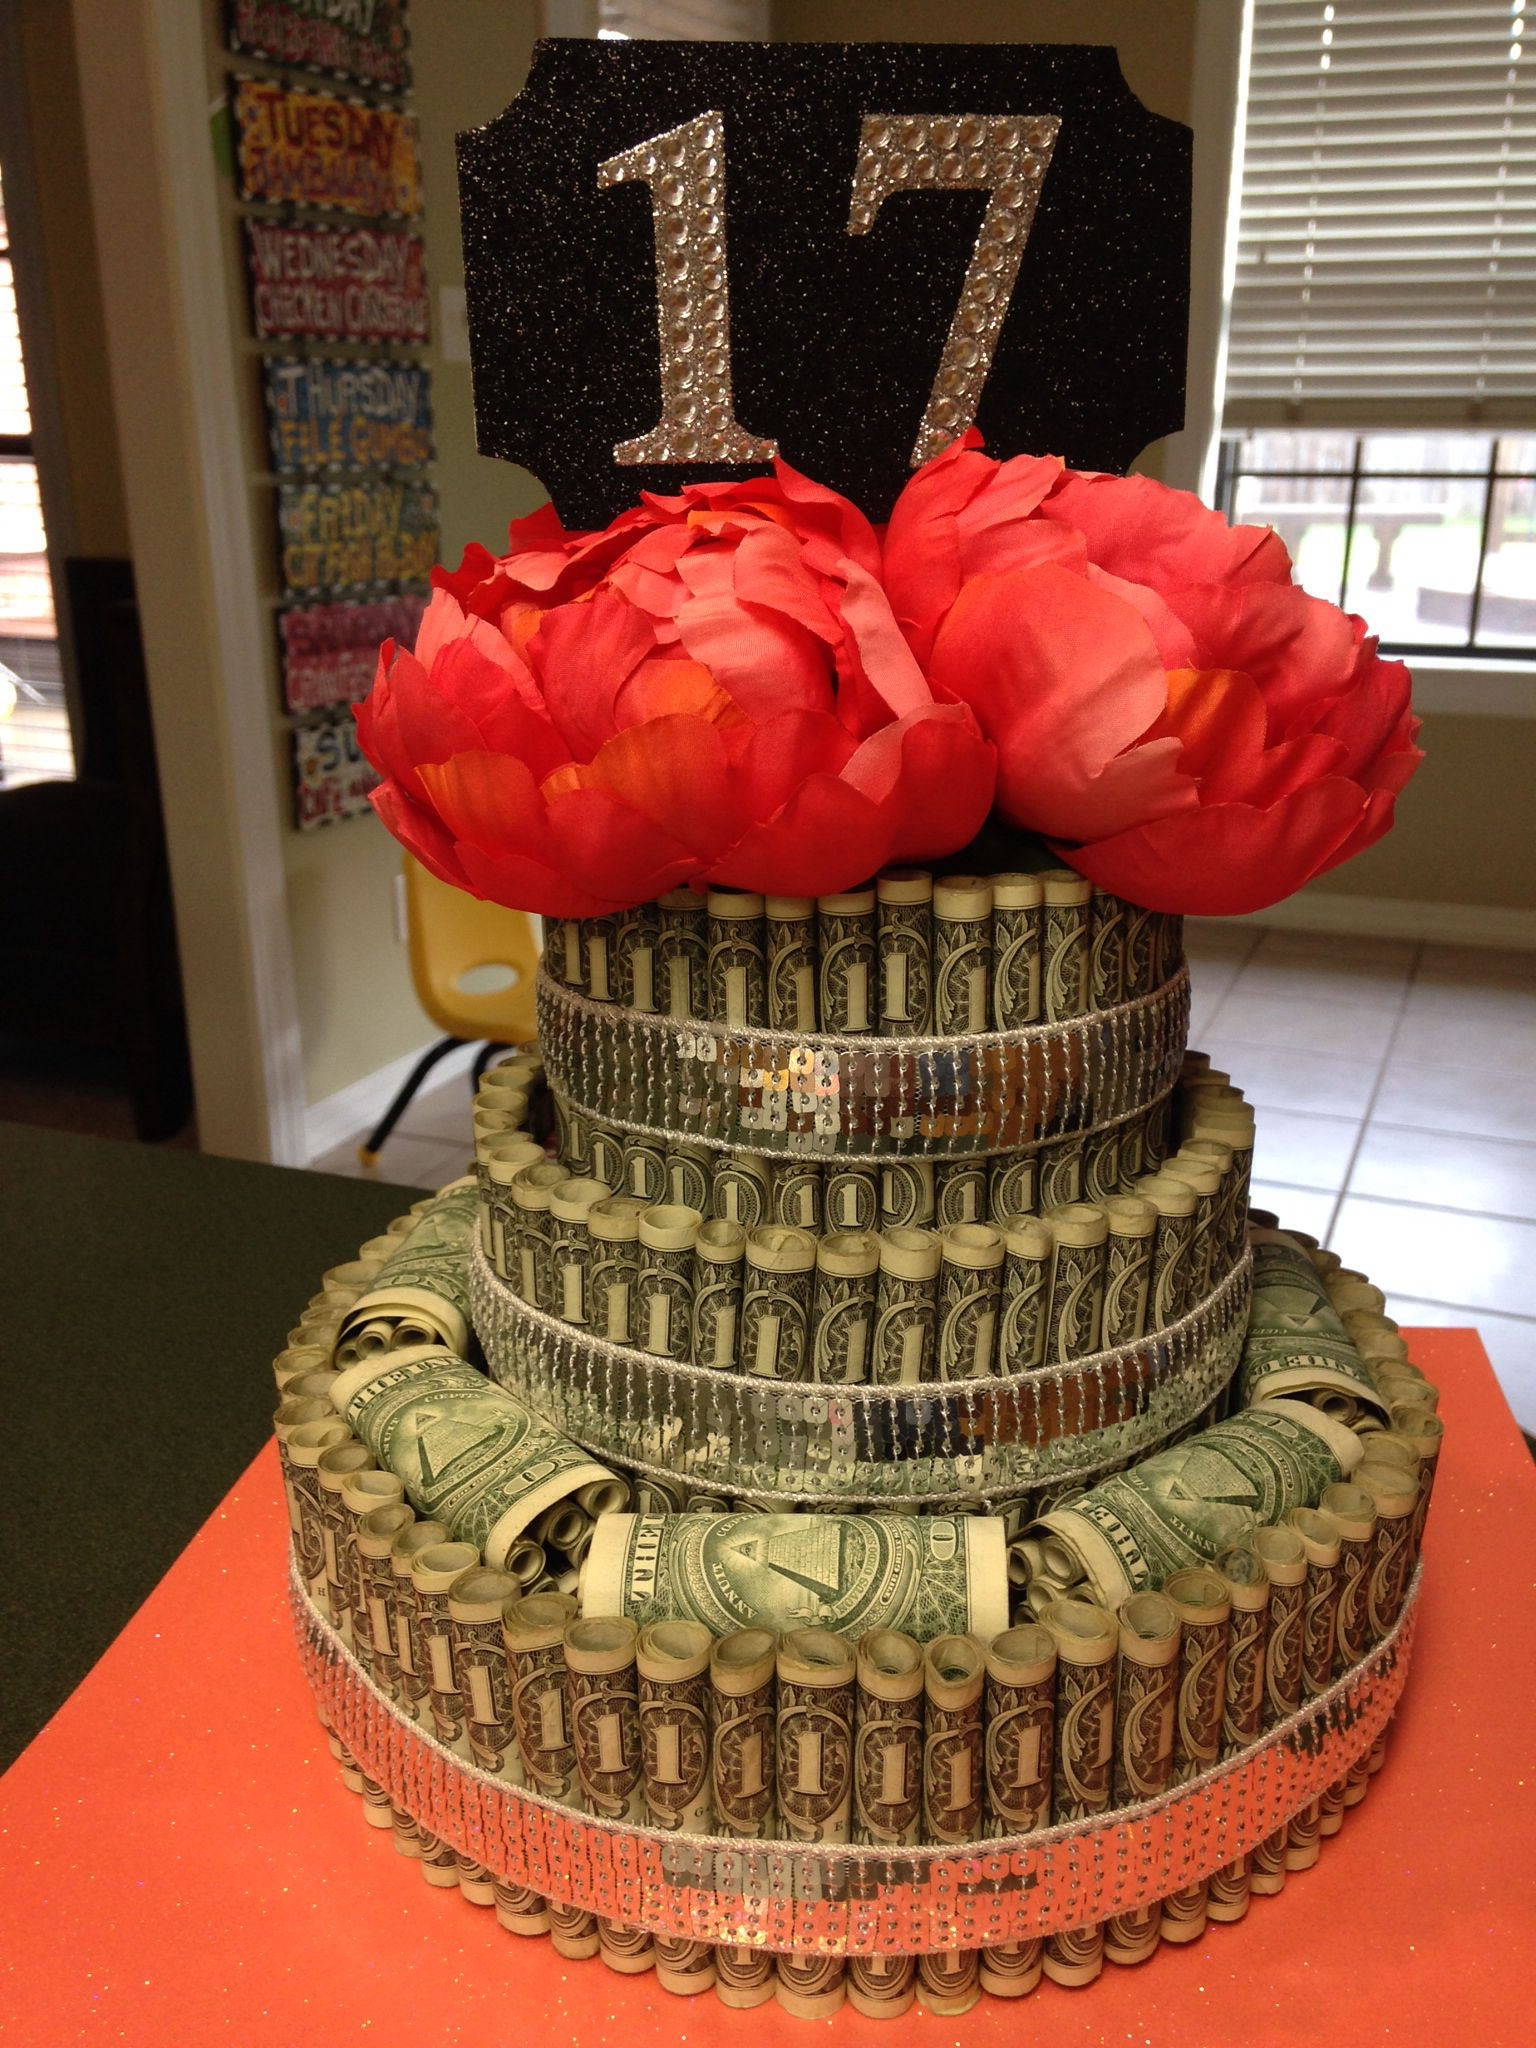 17th birthday. Money cake! 17th birthday party ideas